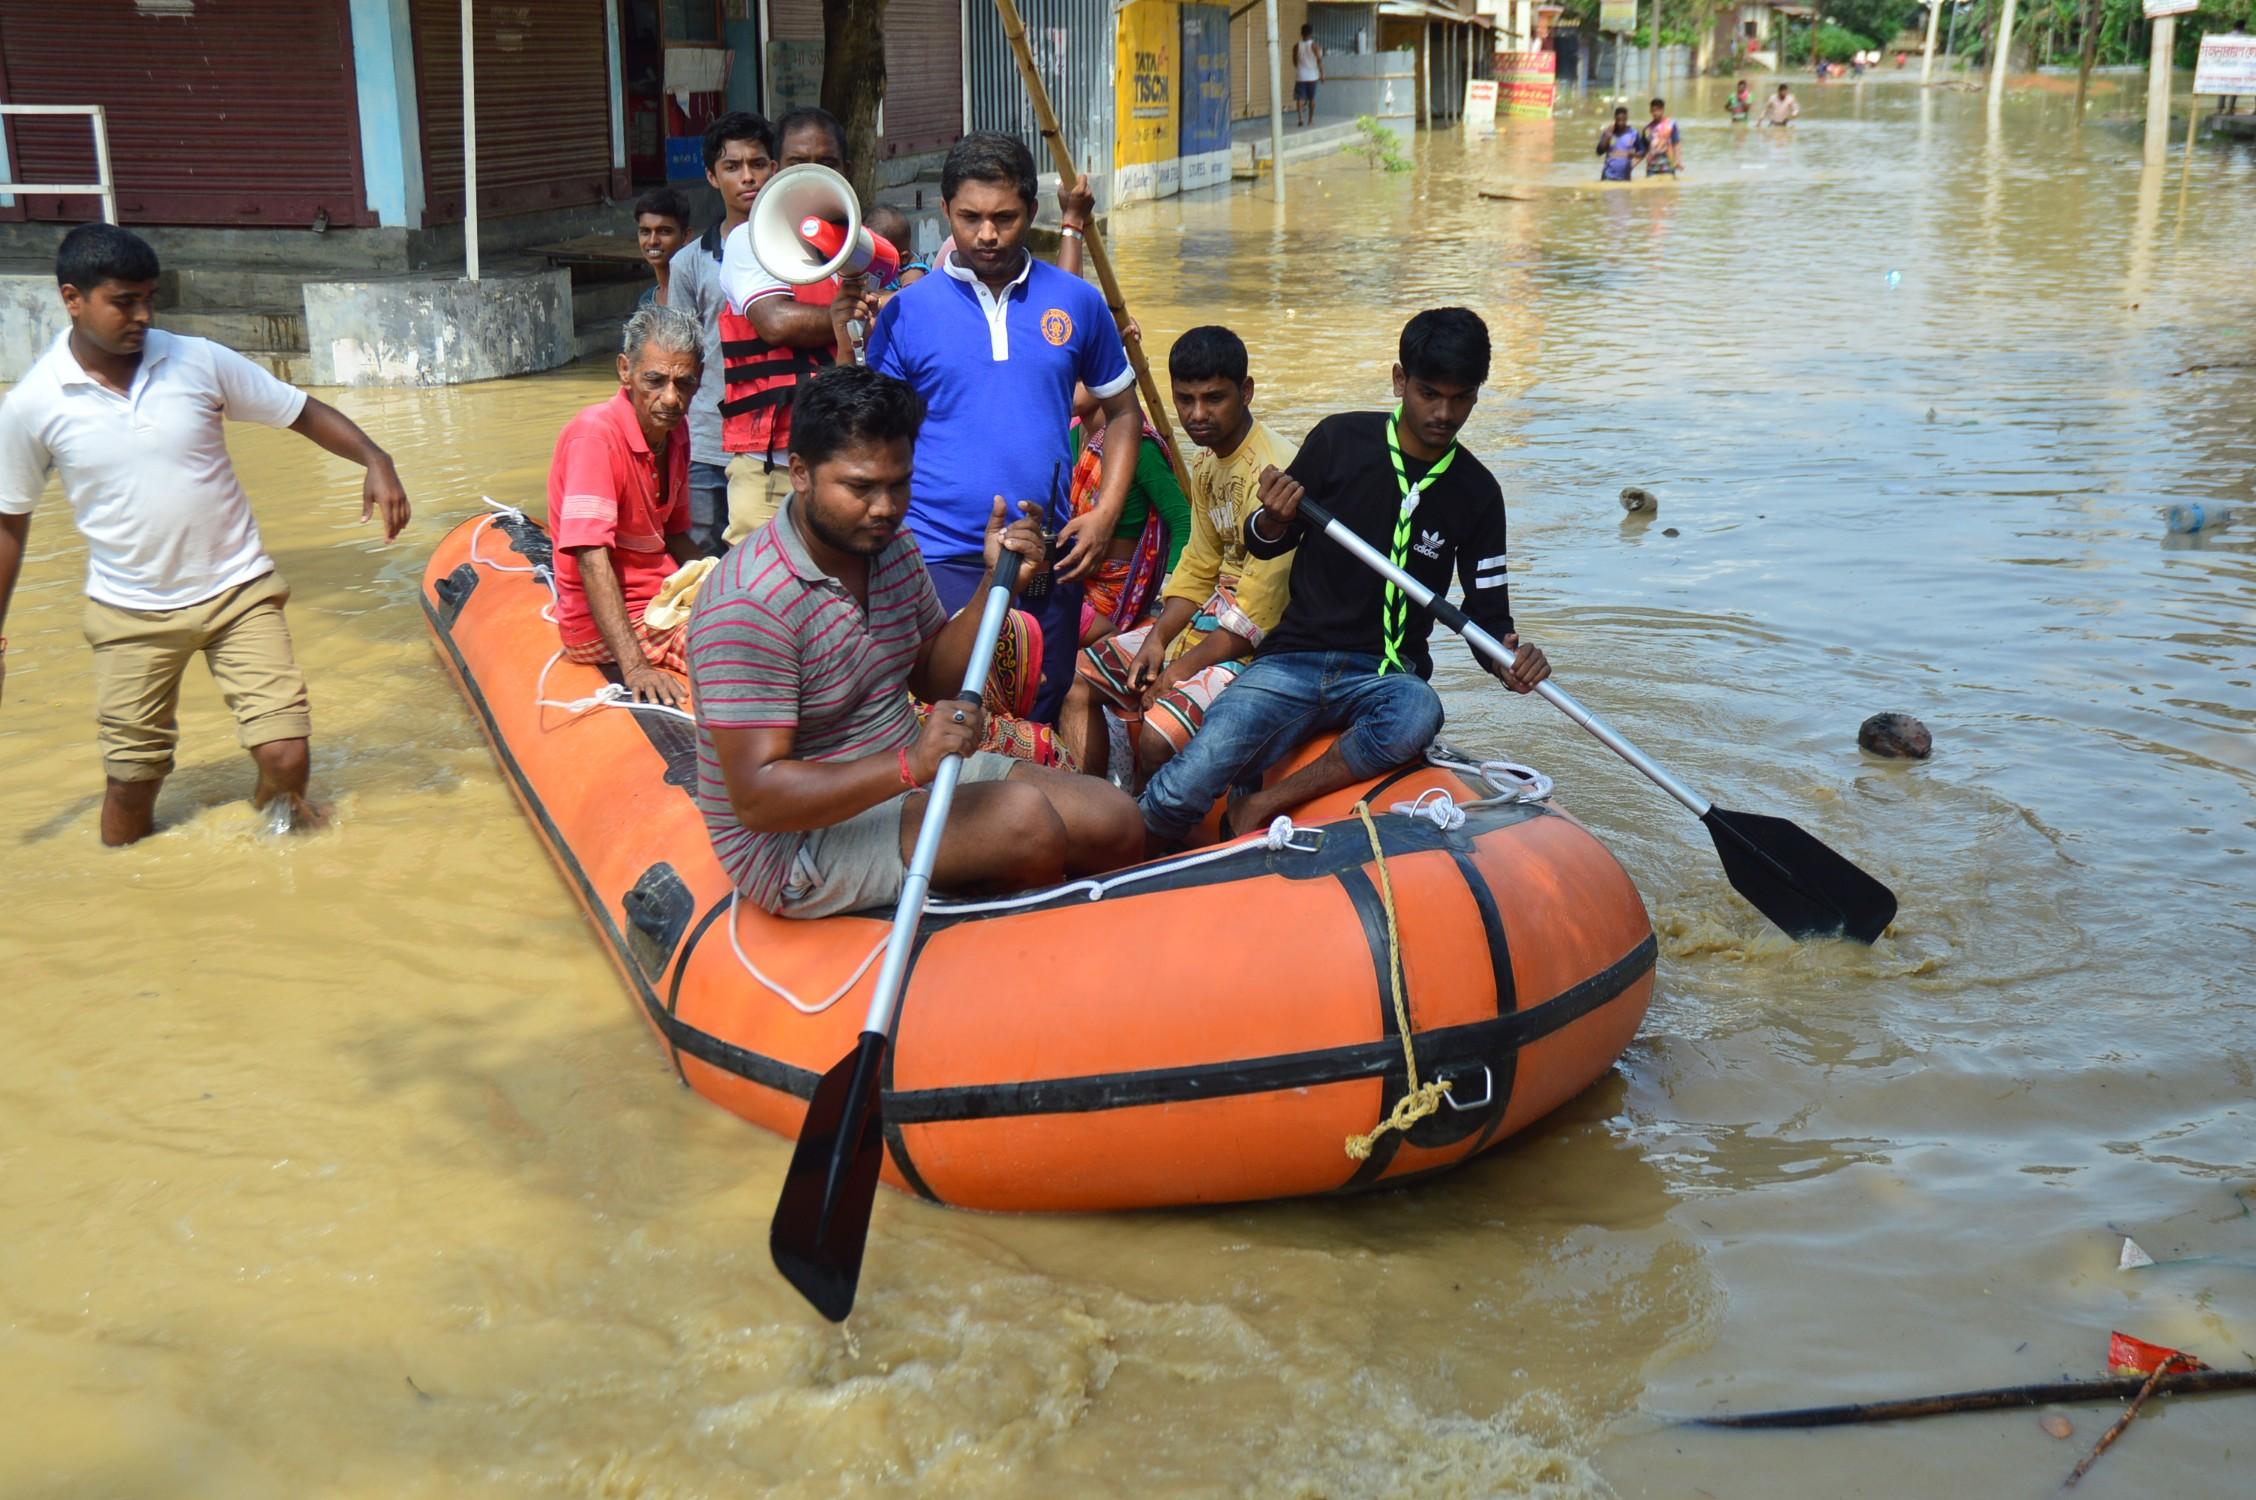 Residents of Khayerpur row to safety. Photo credit: Abhishek Saha